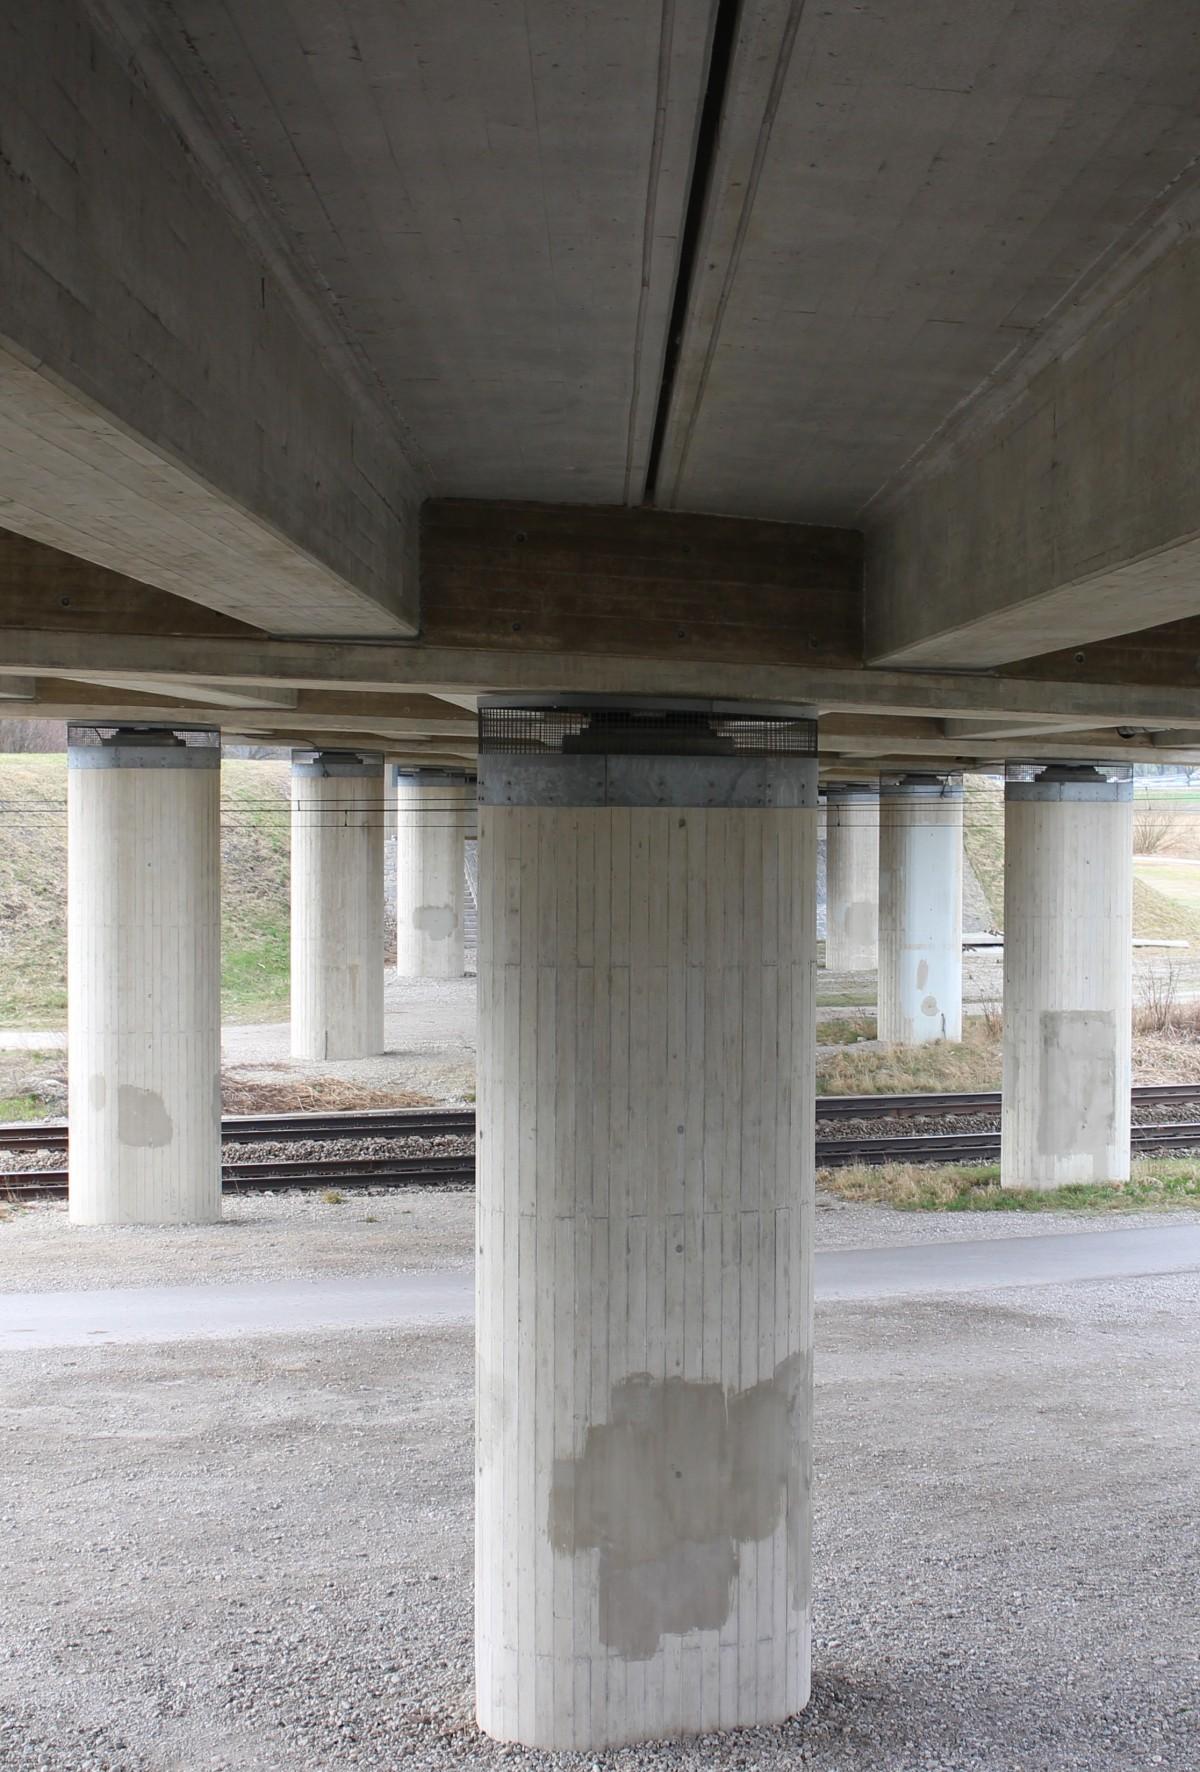 Free Images Architecture Building Overpass Walkway Transport Pillar Street Scene